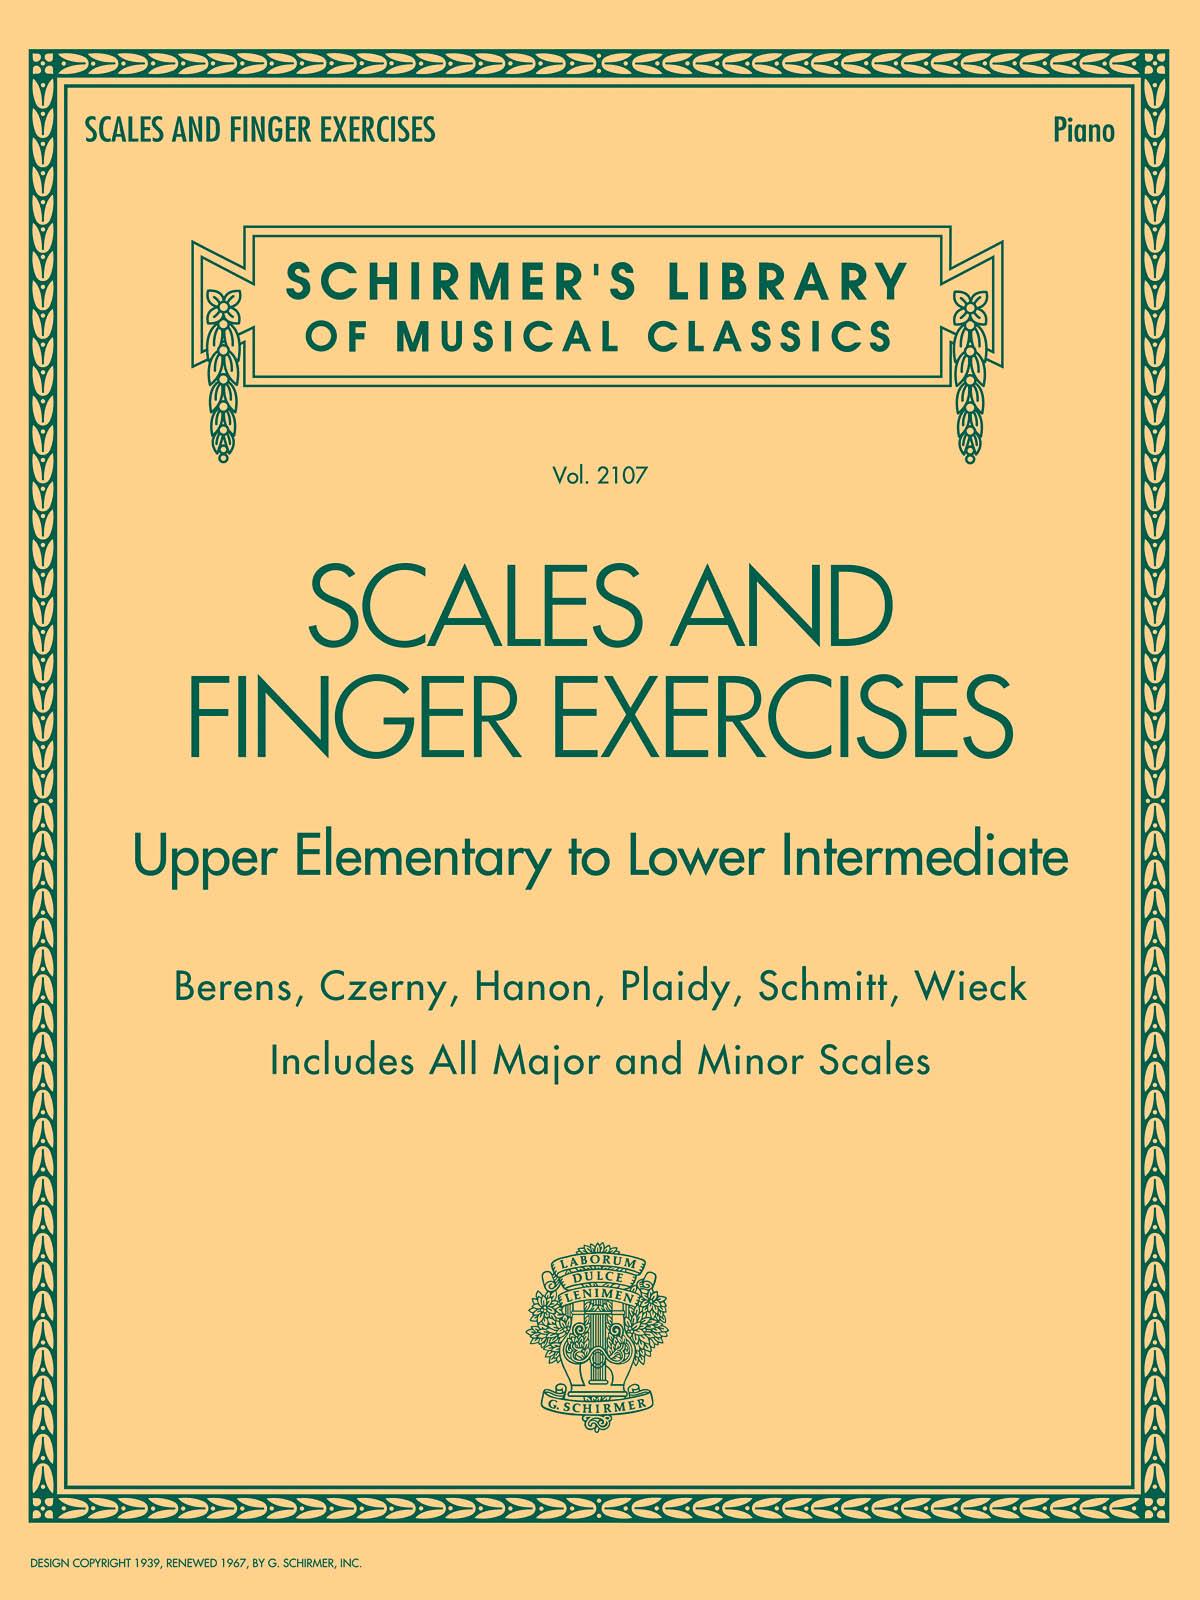 Scales and Finger Exercises: Piano: Instrumental Album